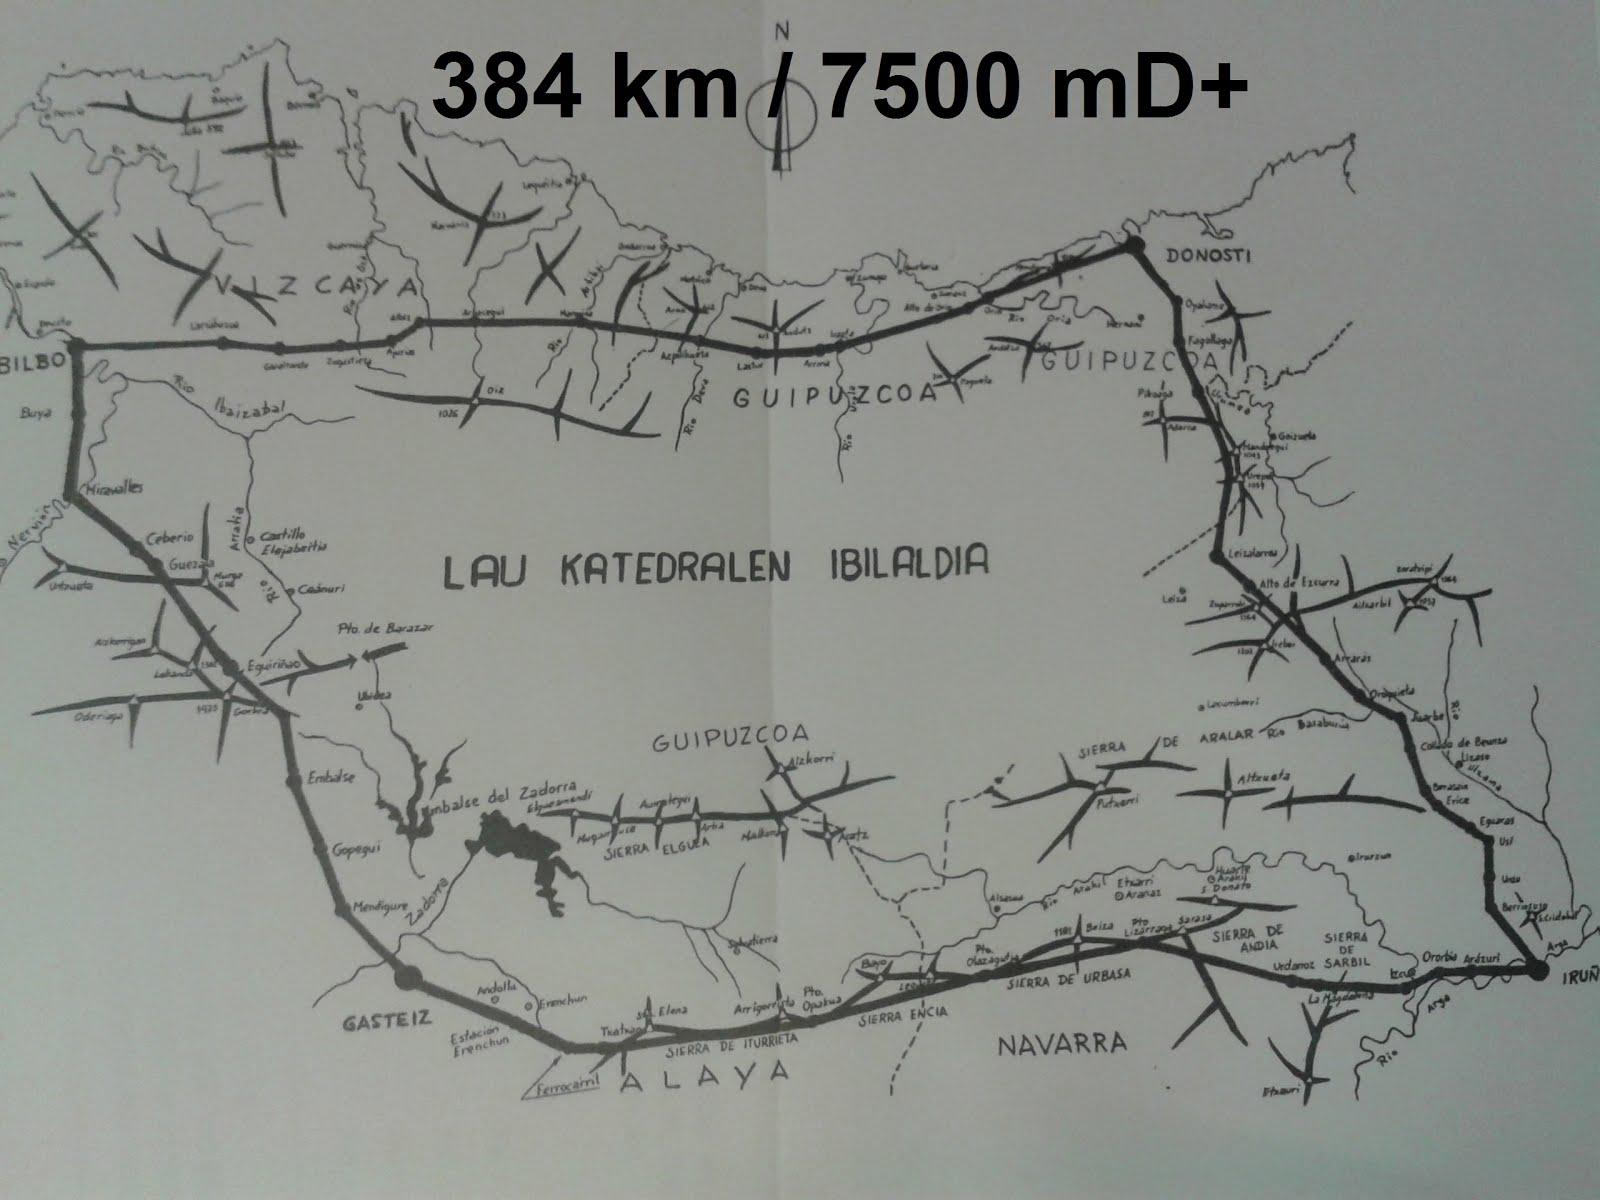 4 Katedralak: 384 km / 7500mD+